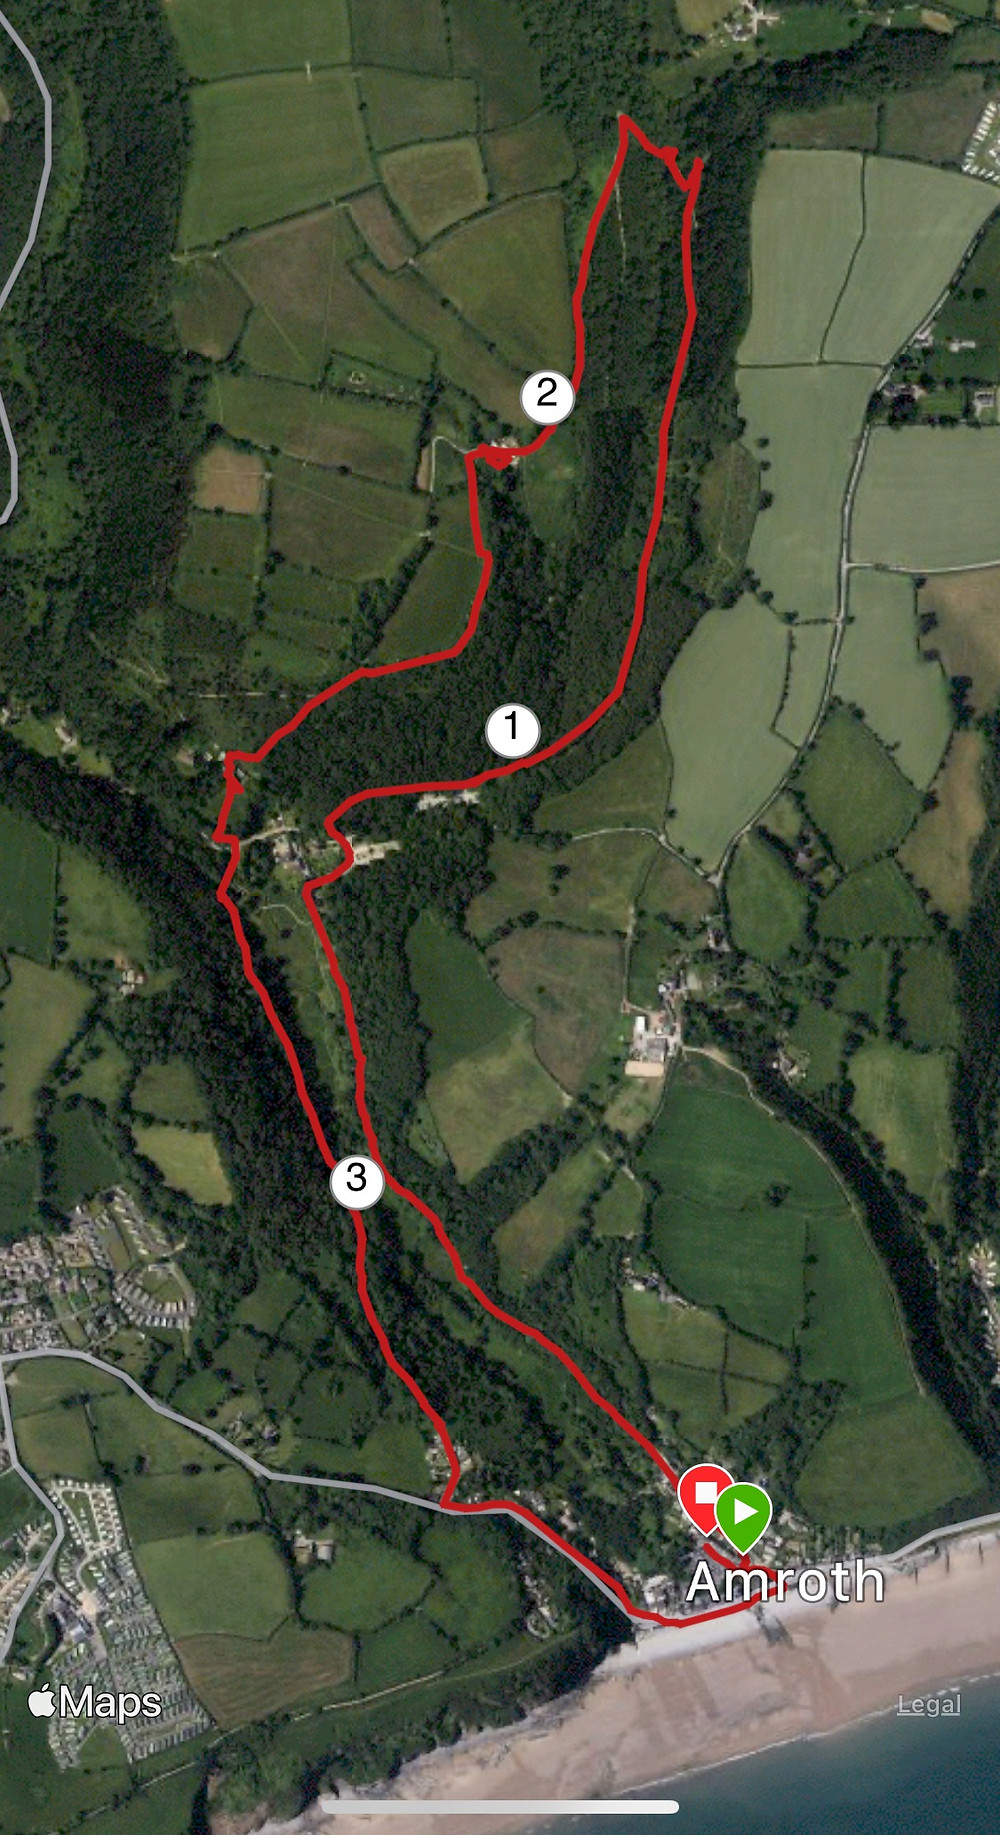 Business Development Thinking | 3.75 Mile Good Walk